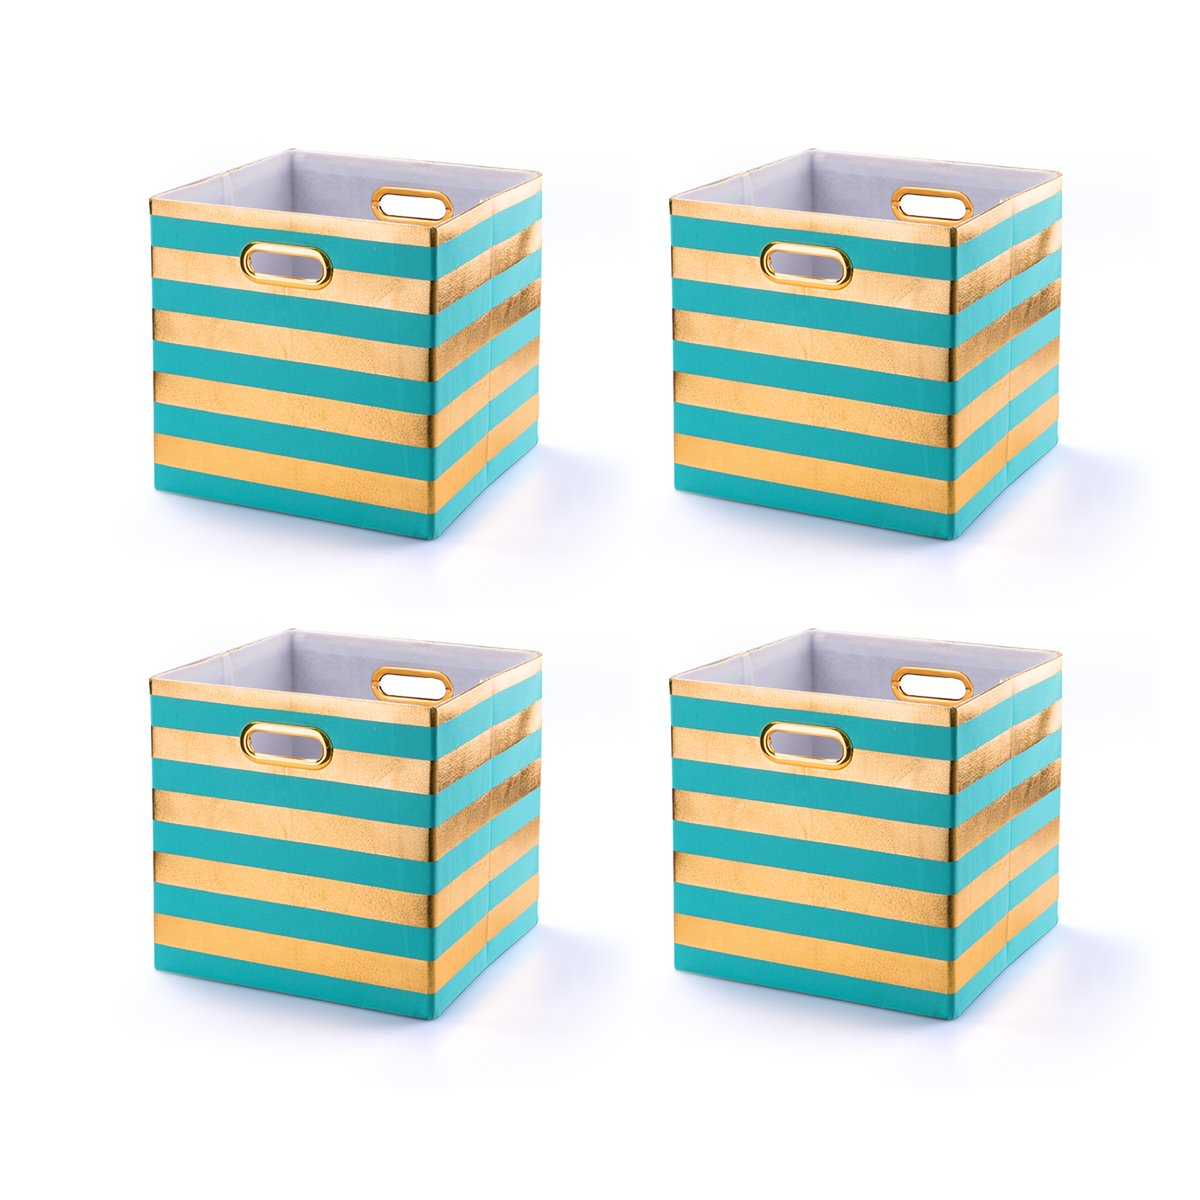 BAIST Fabric Storage Bins,Heavy Duty Square Gold Canvas Fabric Storage Cubes Bins Baskets For Bedroom Shelf School Days,set of 4,Aqua Stripe (11×11×11'')